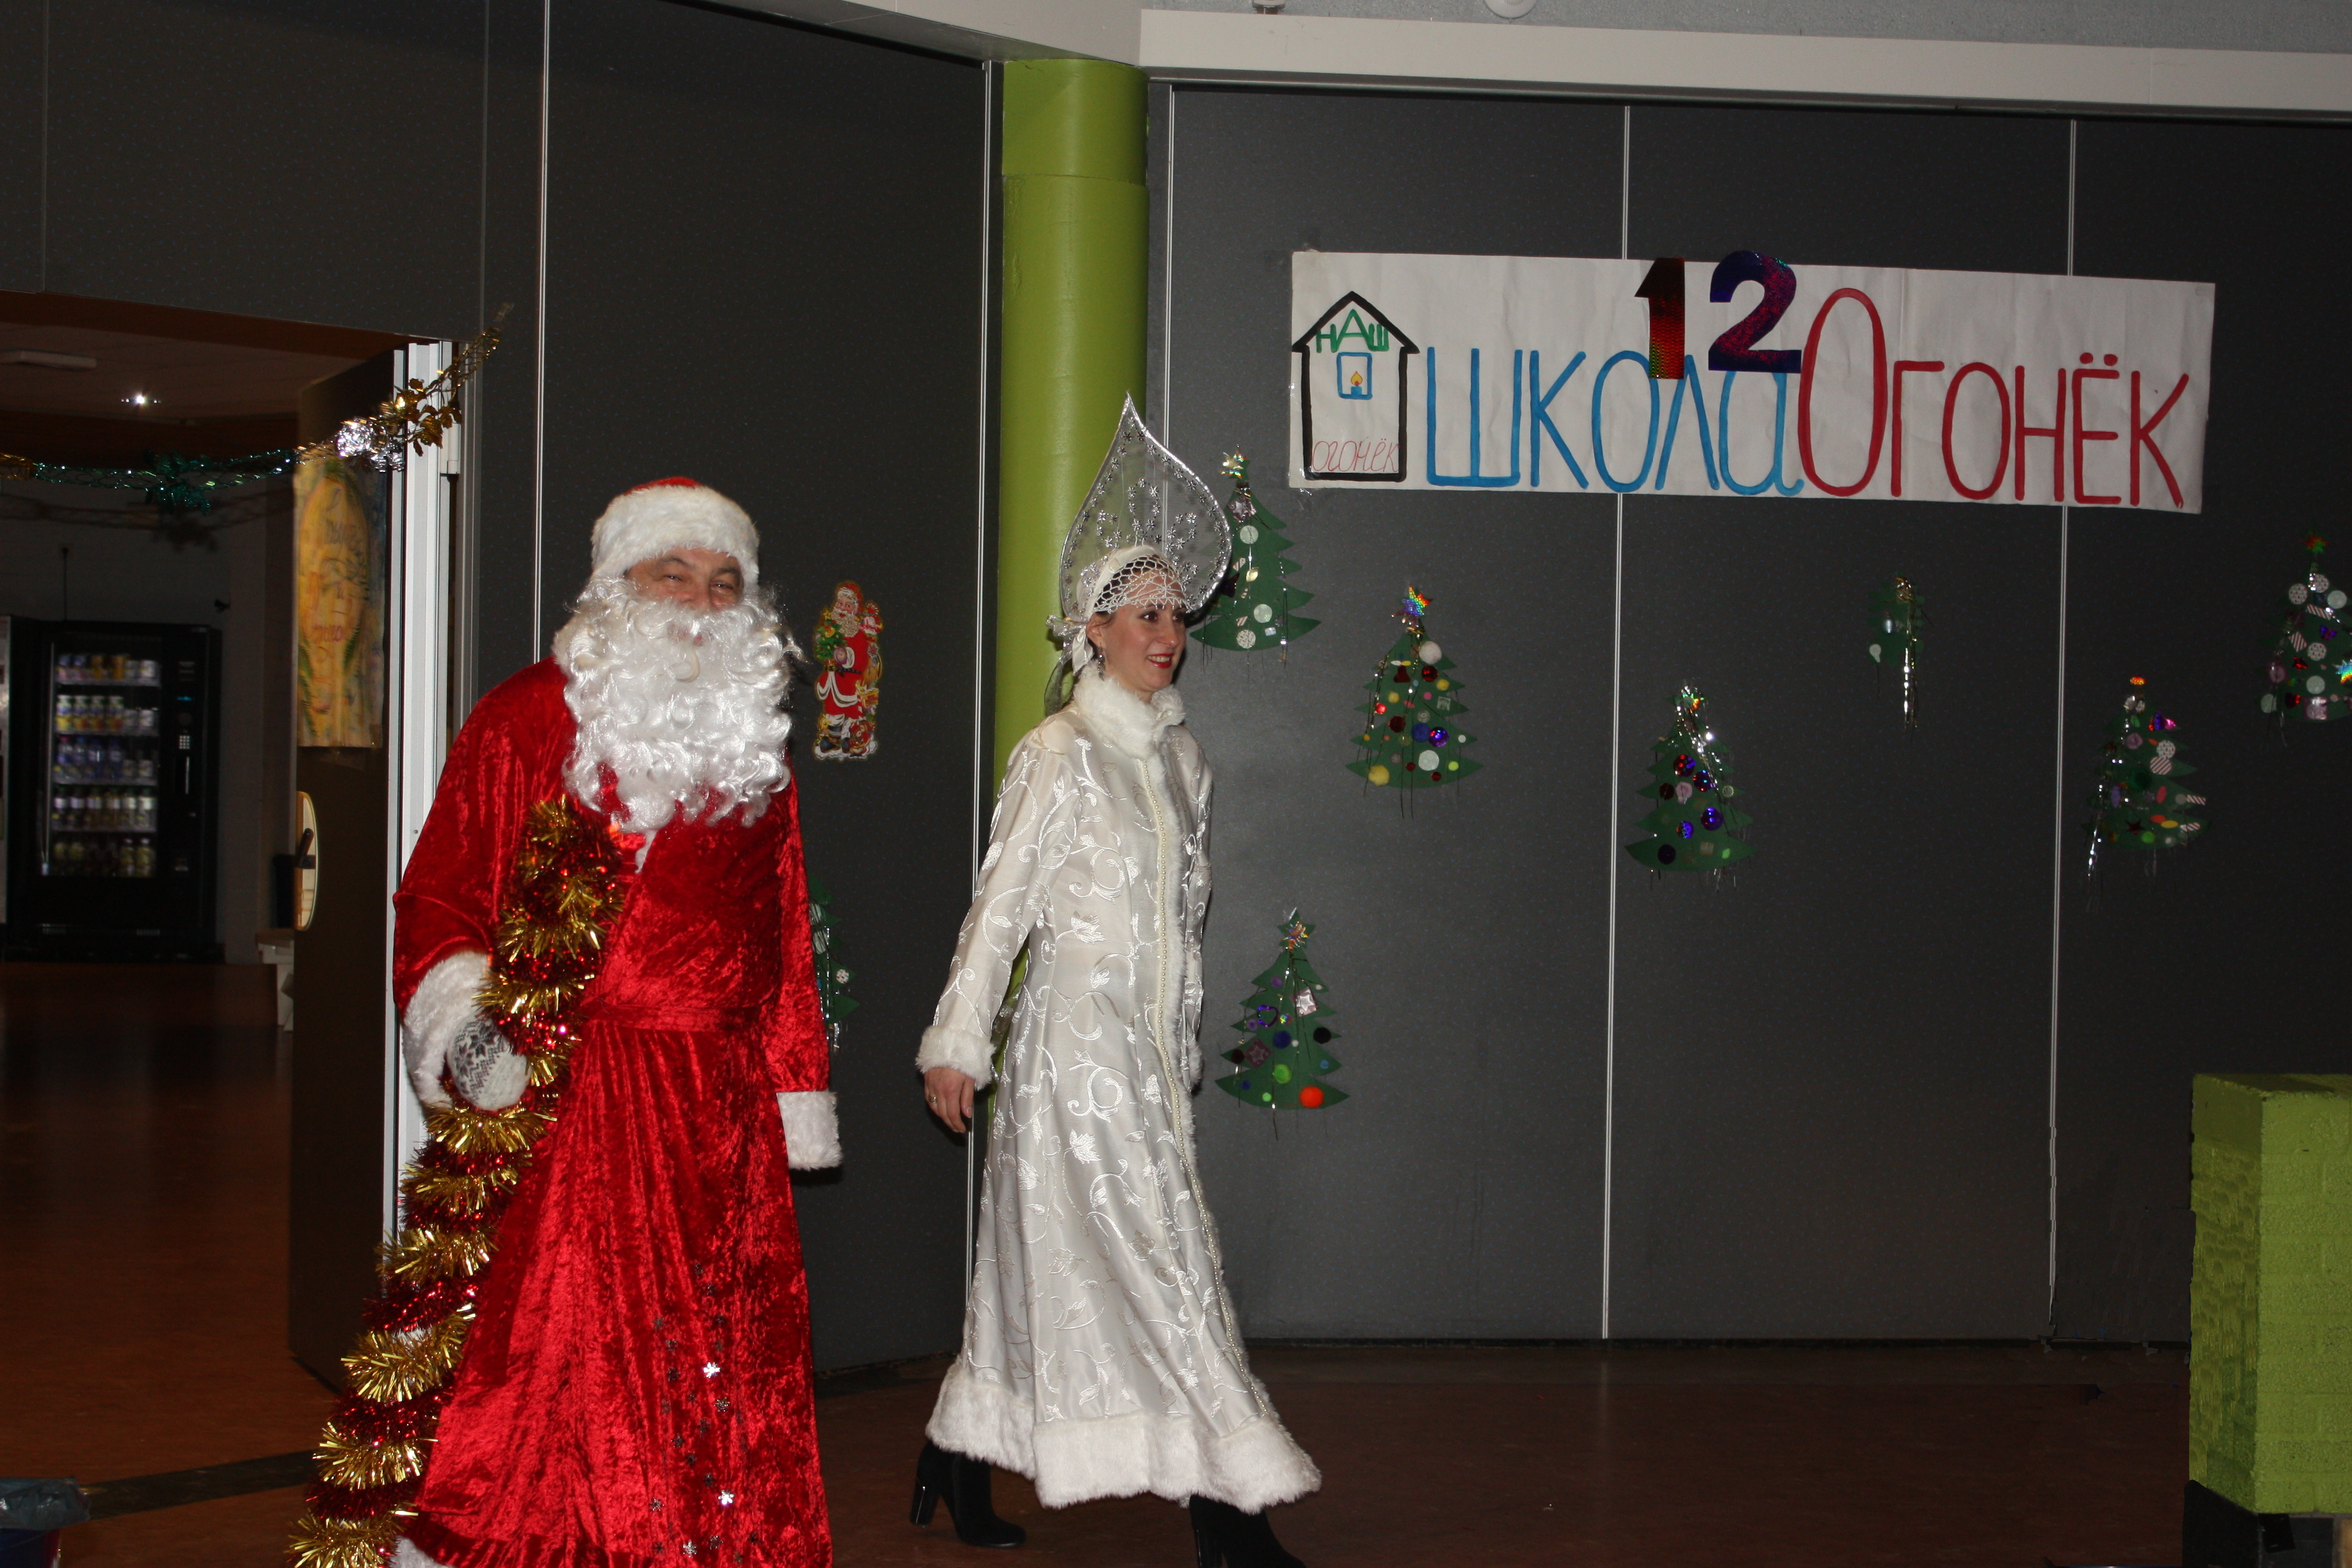 на праздник приехали Дед Мороз и Снегурочка